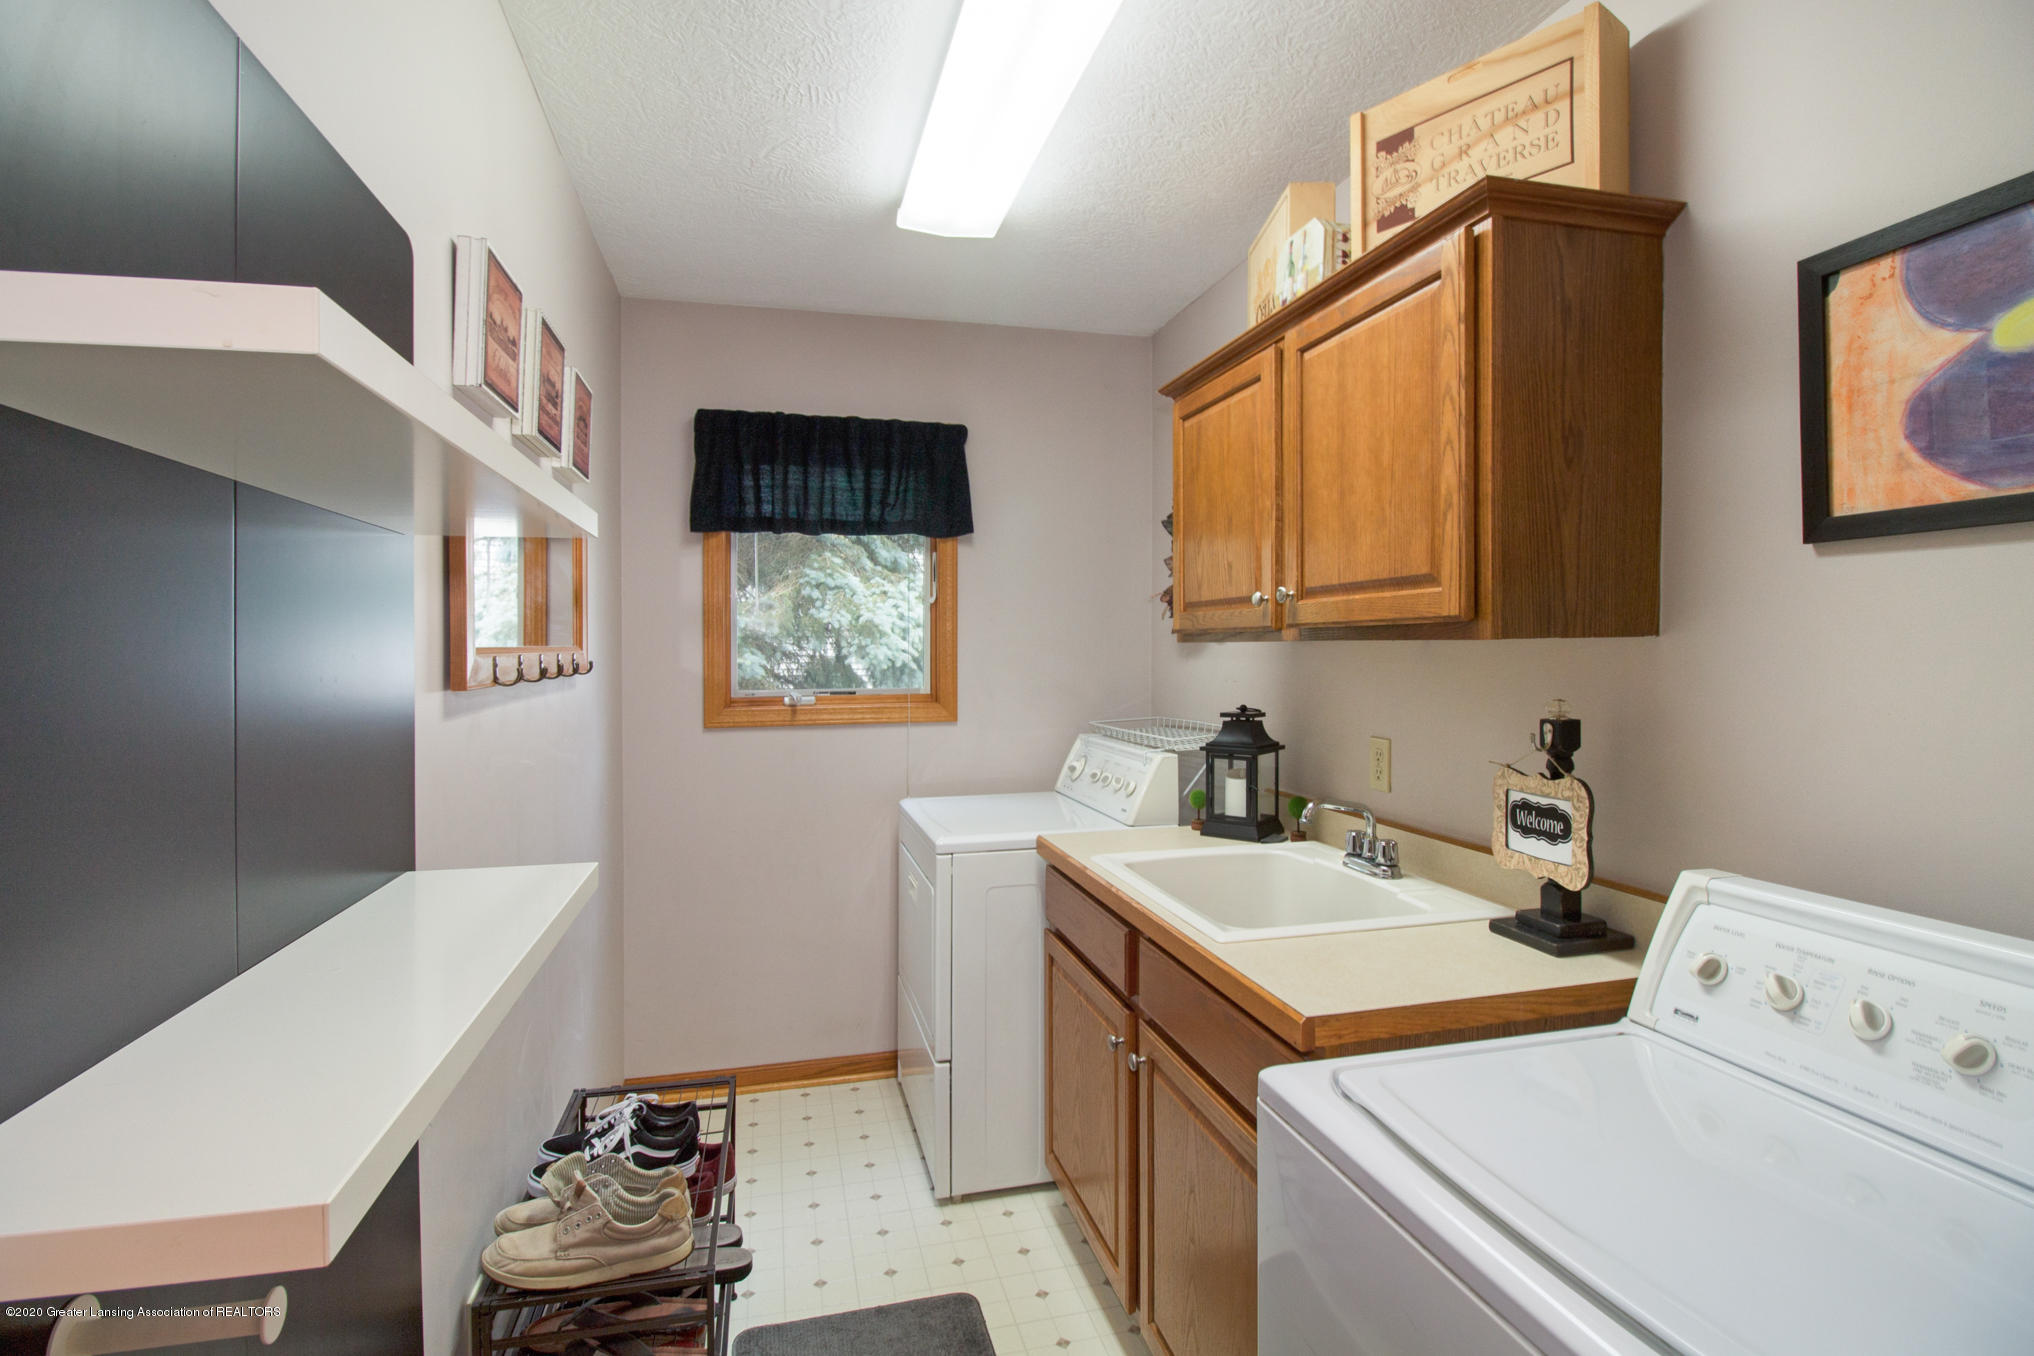 5130 Runnymede Dr - 1st Floor Laundry - 19